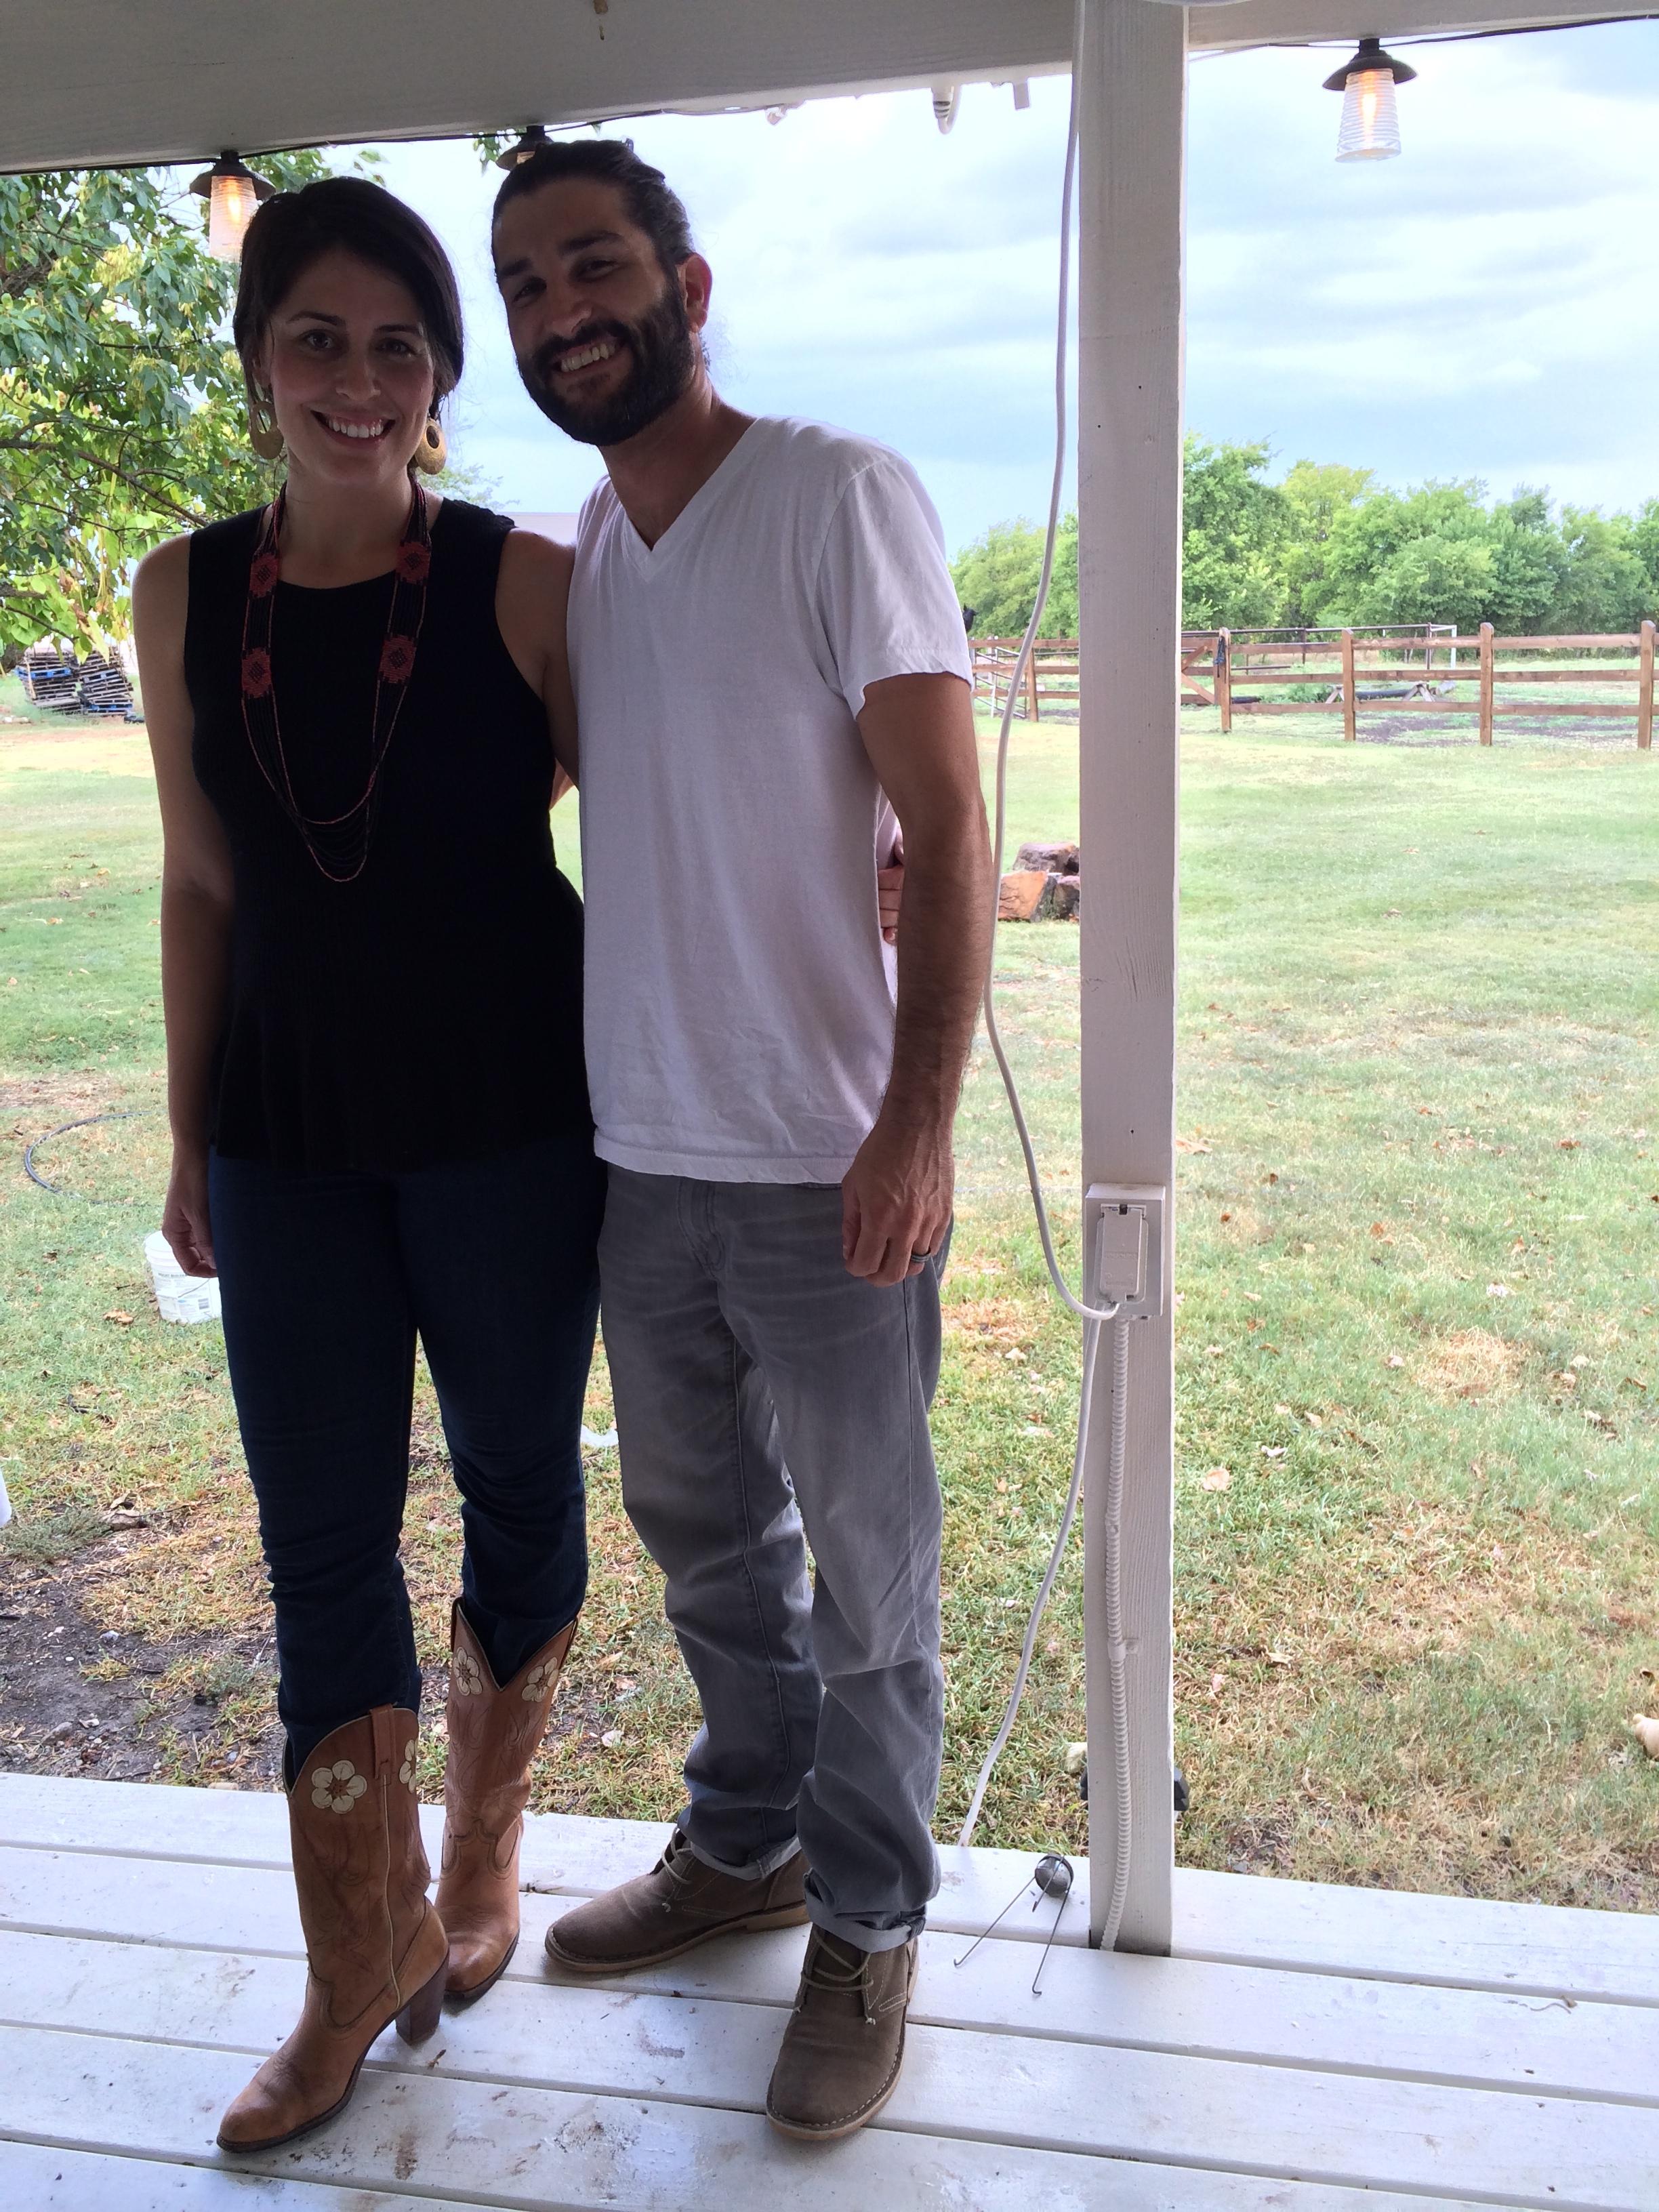 Sam and me - Fall 2014 - three years married